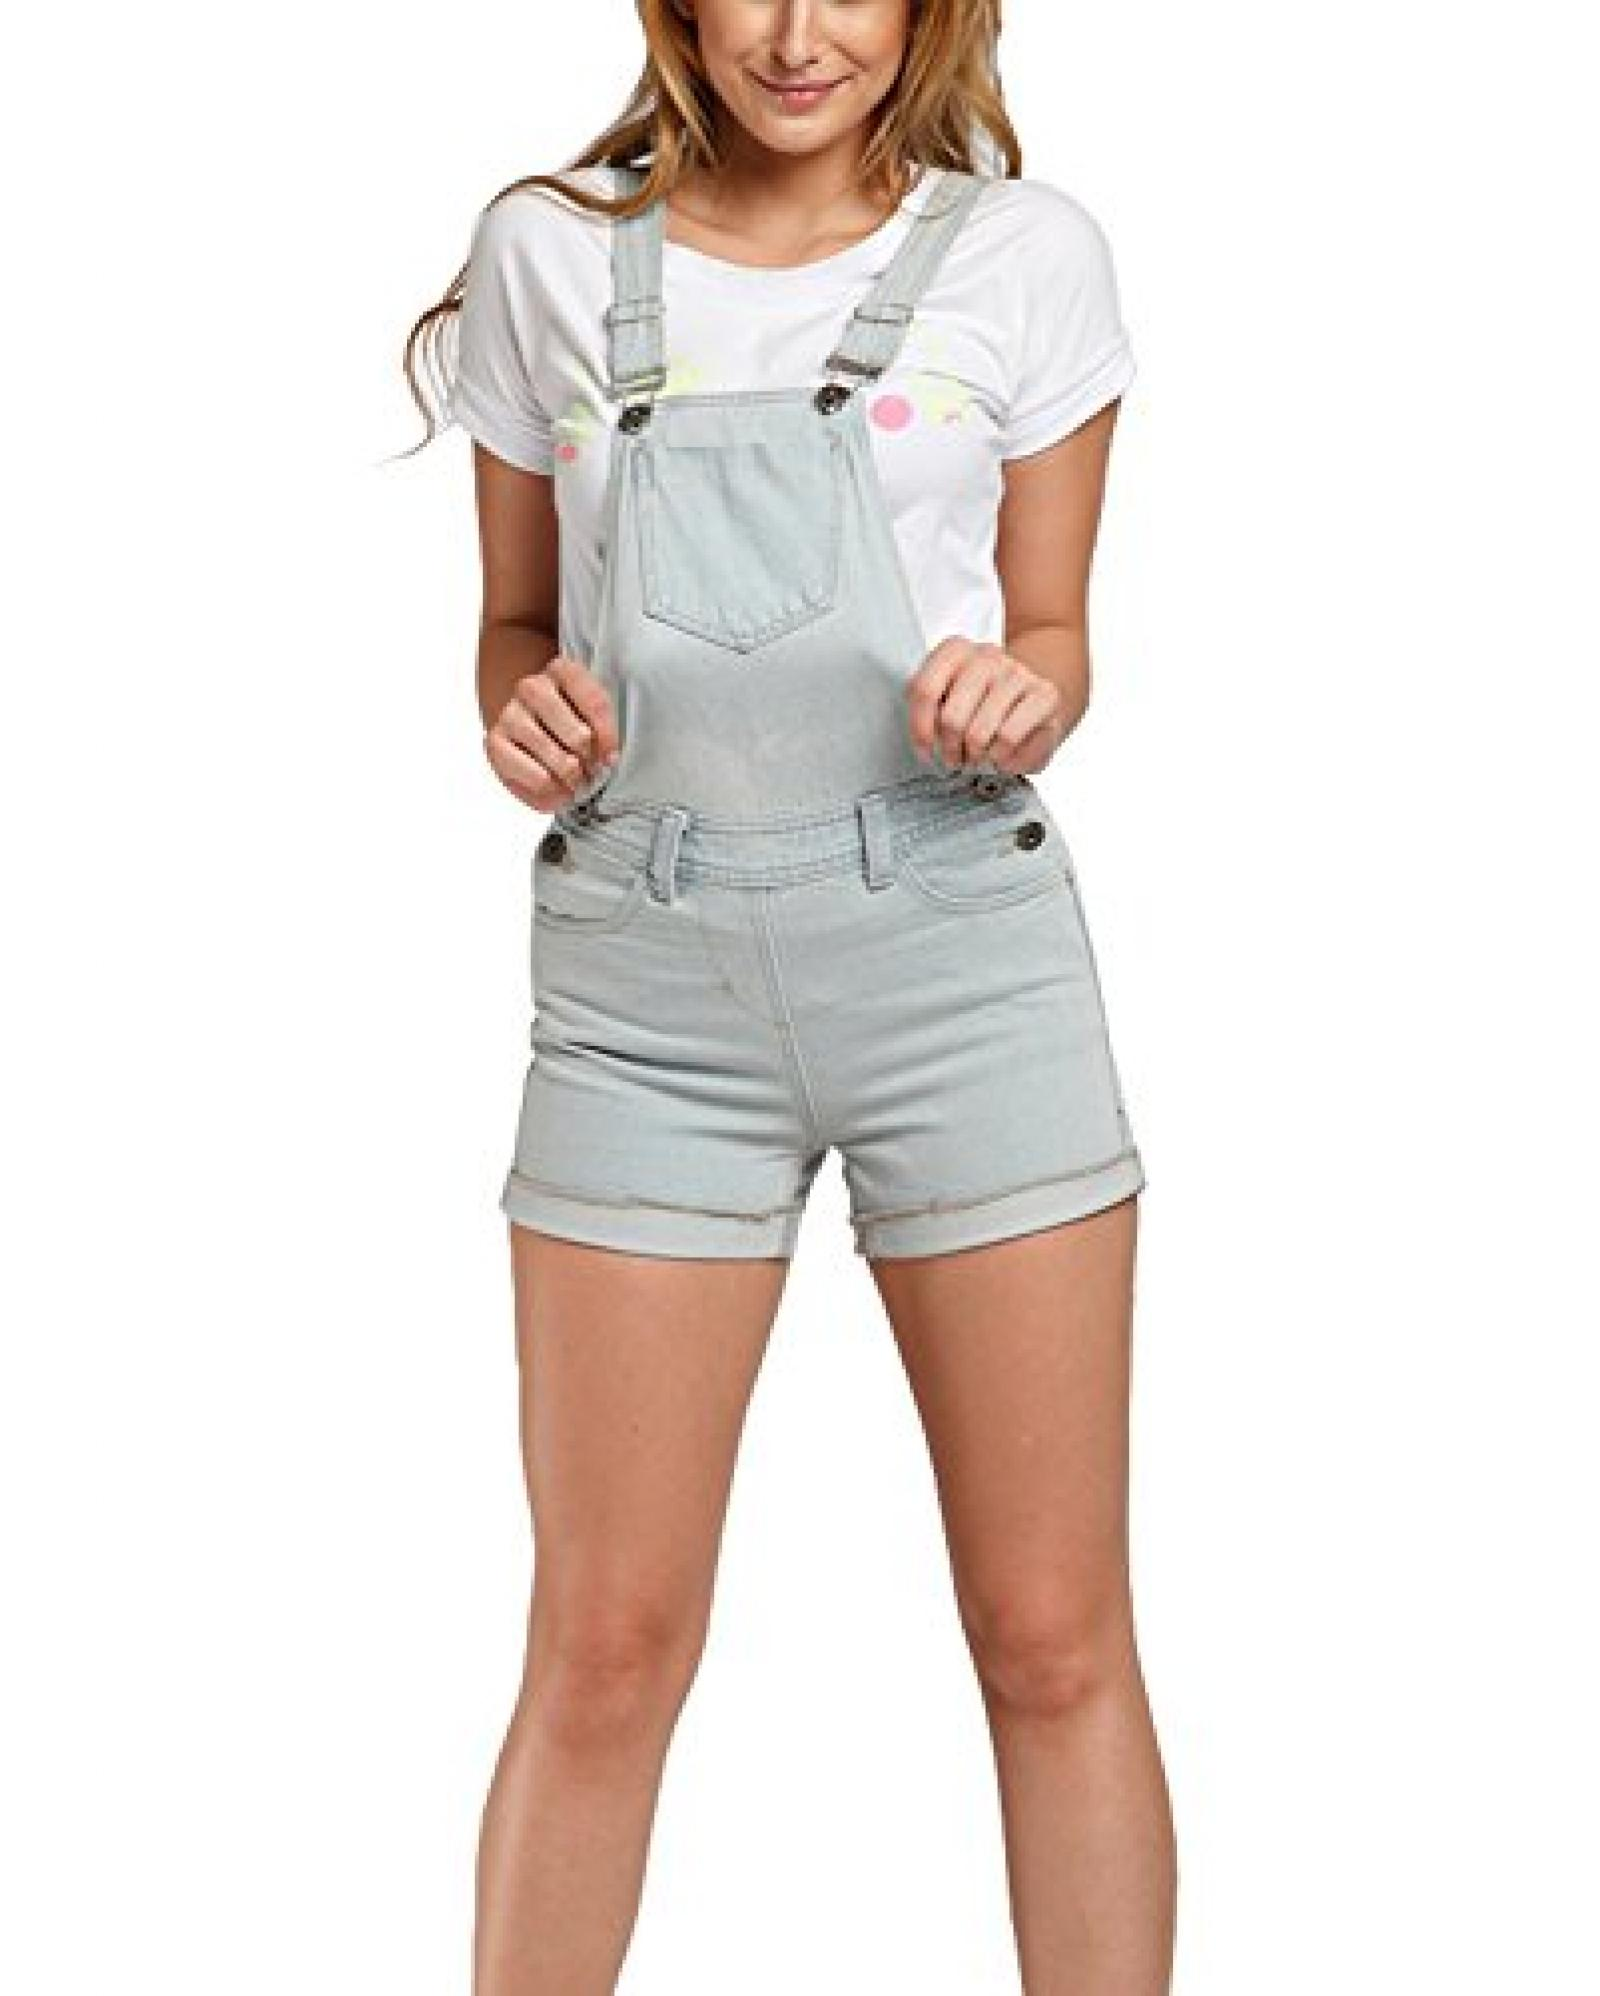 BININBOX®Damen Latzhose Jeans kurz Jeans Shorts Latzshorts Denim Hot Pants Taschen Jumpsuit Träger umschlagend